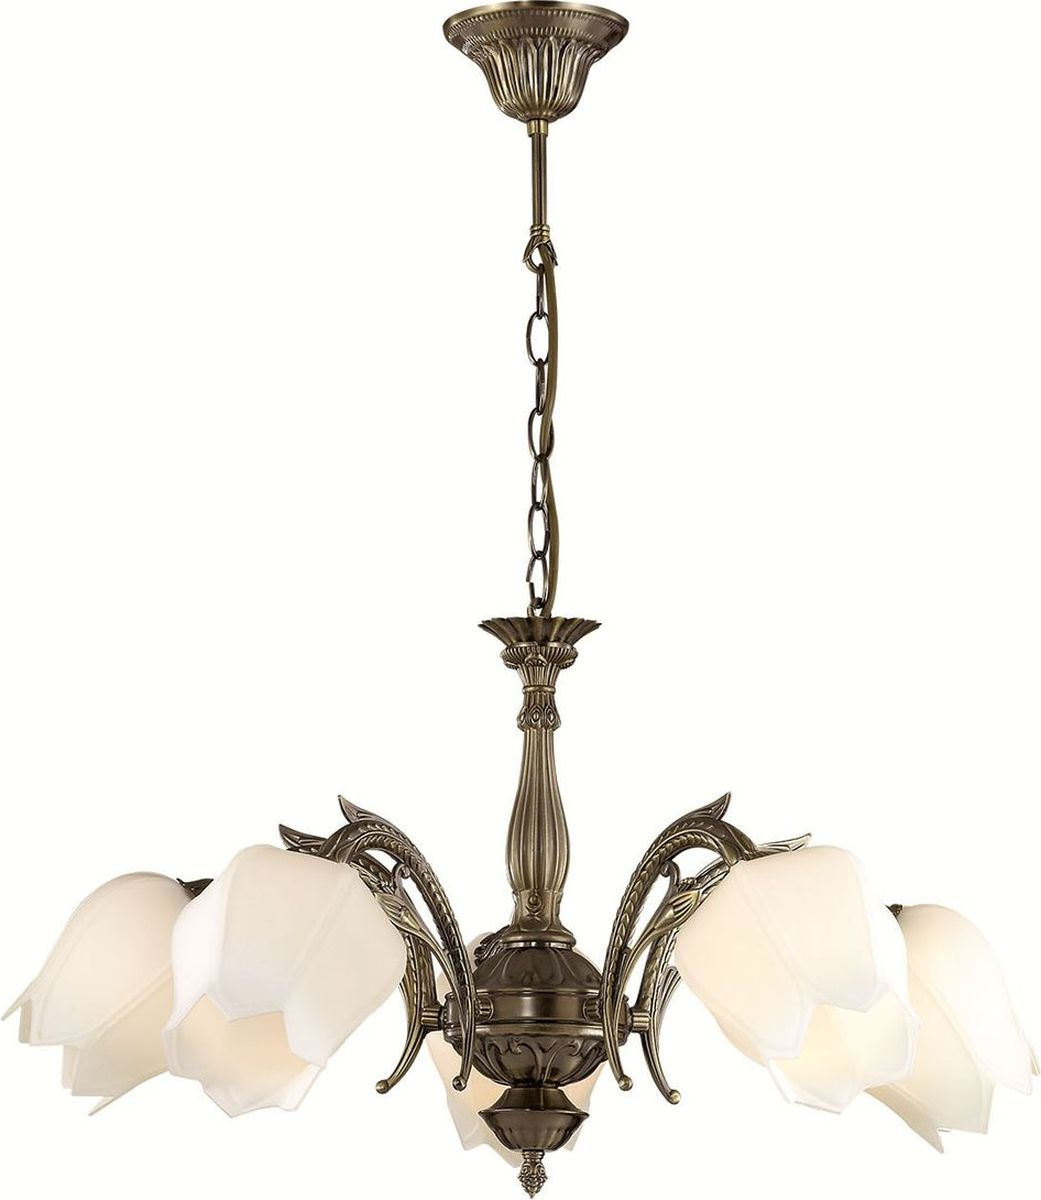 Люстра подвесная Lumion Lysette, цвет: белый, E27, 60 Вт. 2986/52986/5